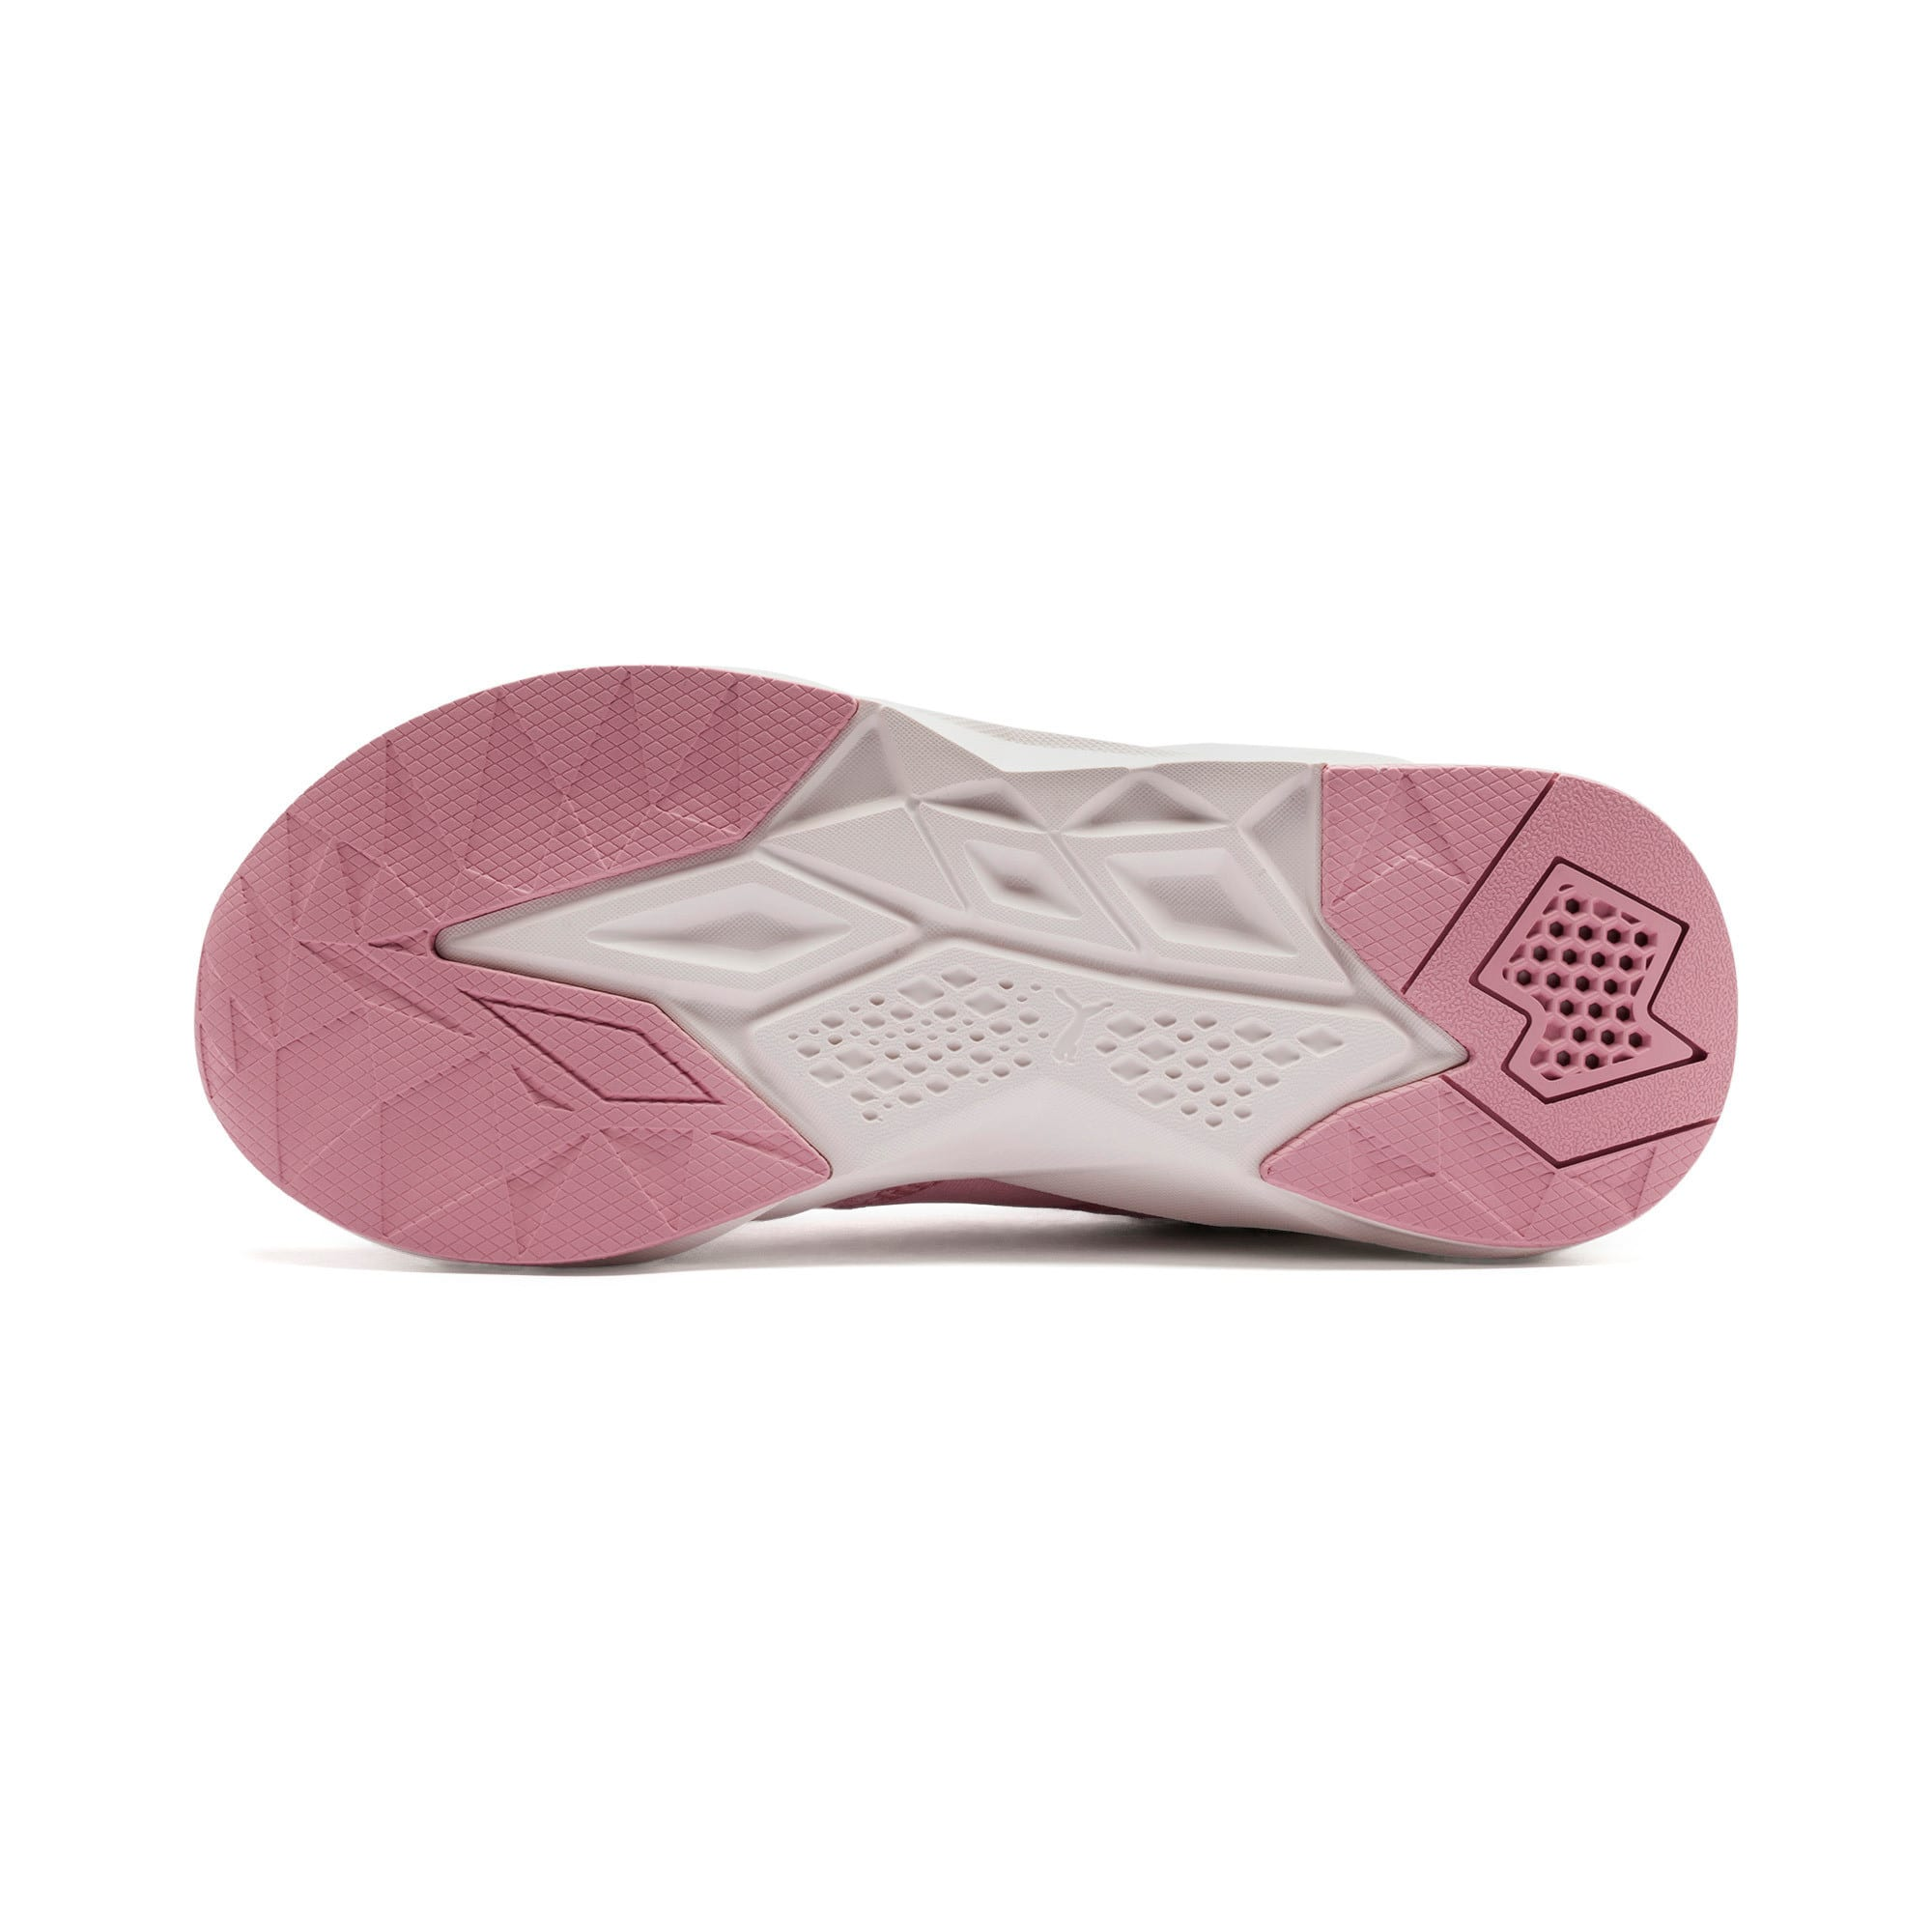 Thumbnail 5 of CELL Plasmic Women's Training Shoes, Bridal Rose-Pastel Parchment, medium